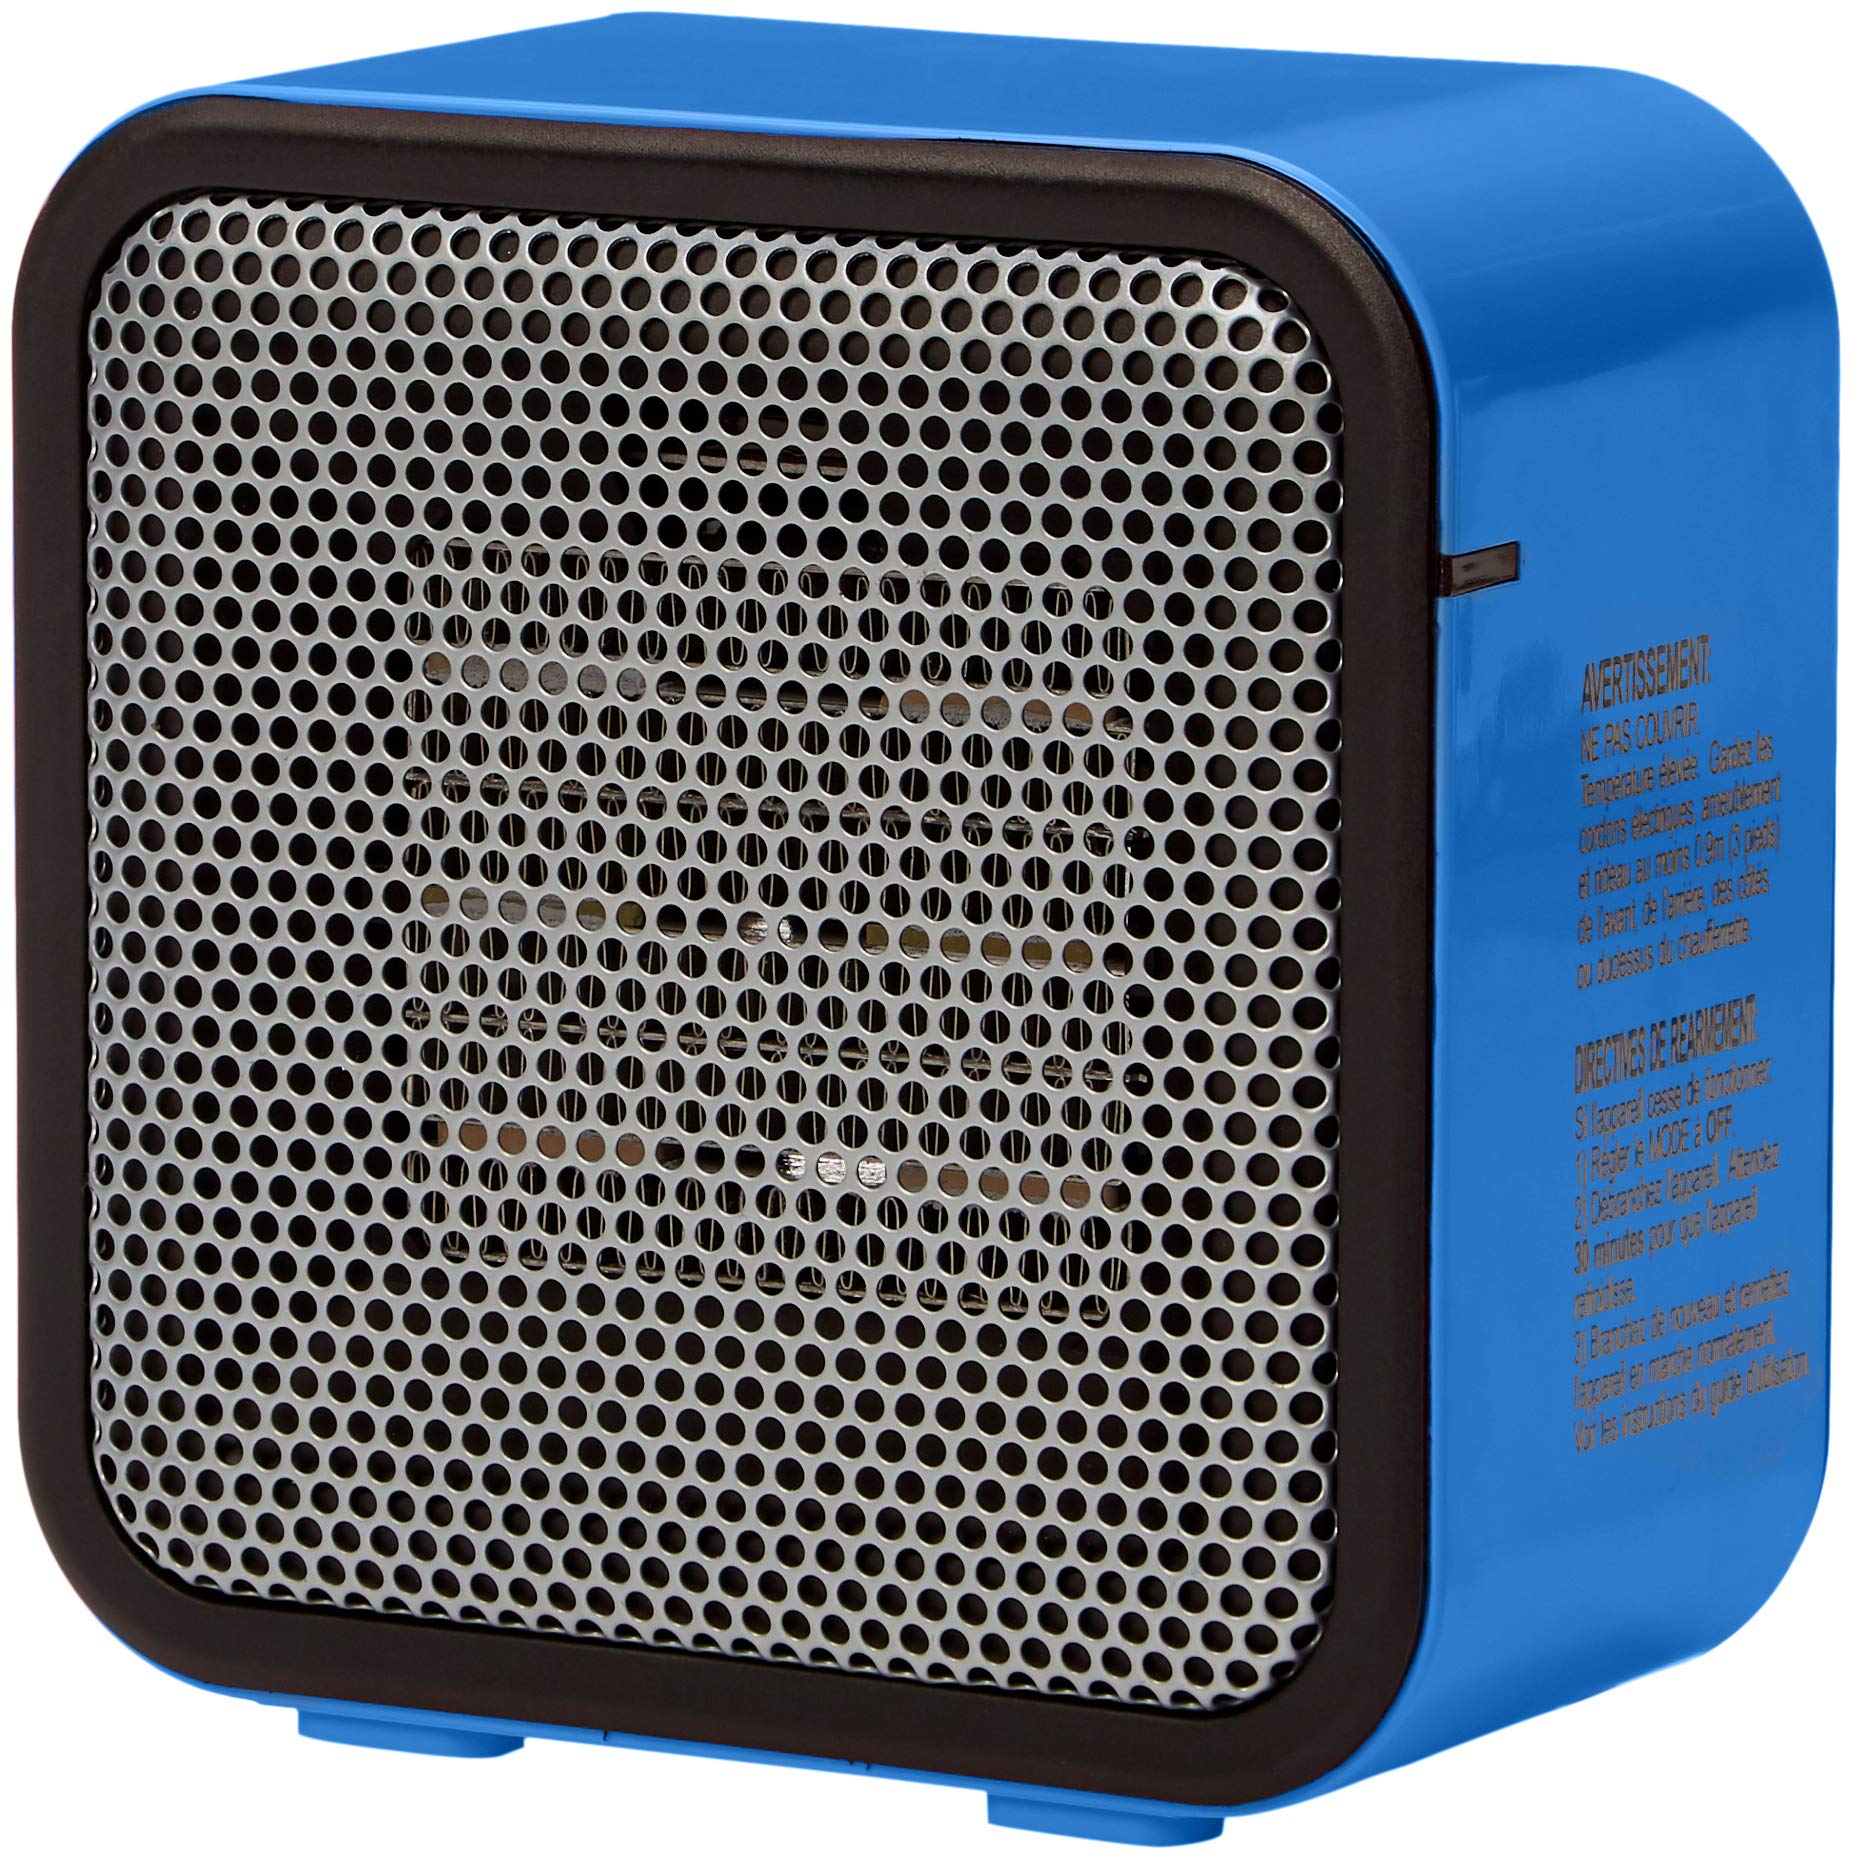 AmazonBasics 500-Watt Ceramic Small Space Personal Mini Heater – Black